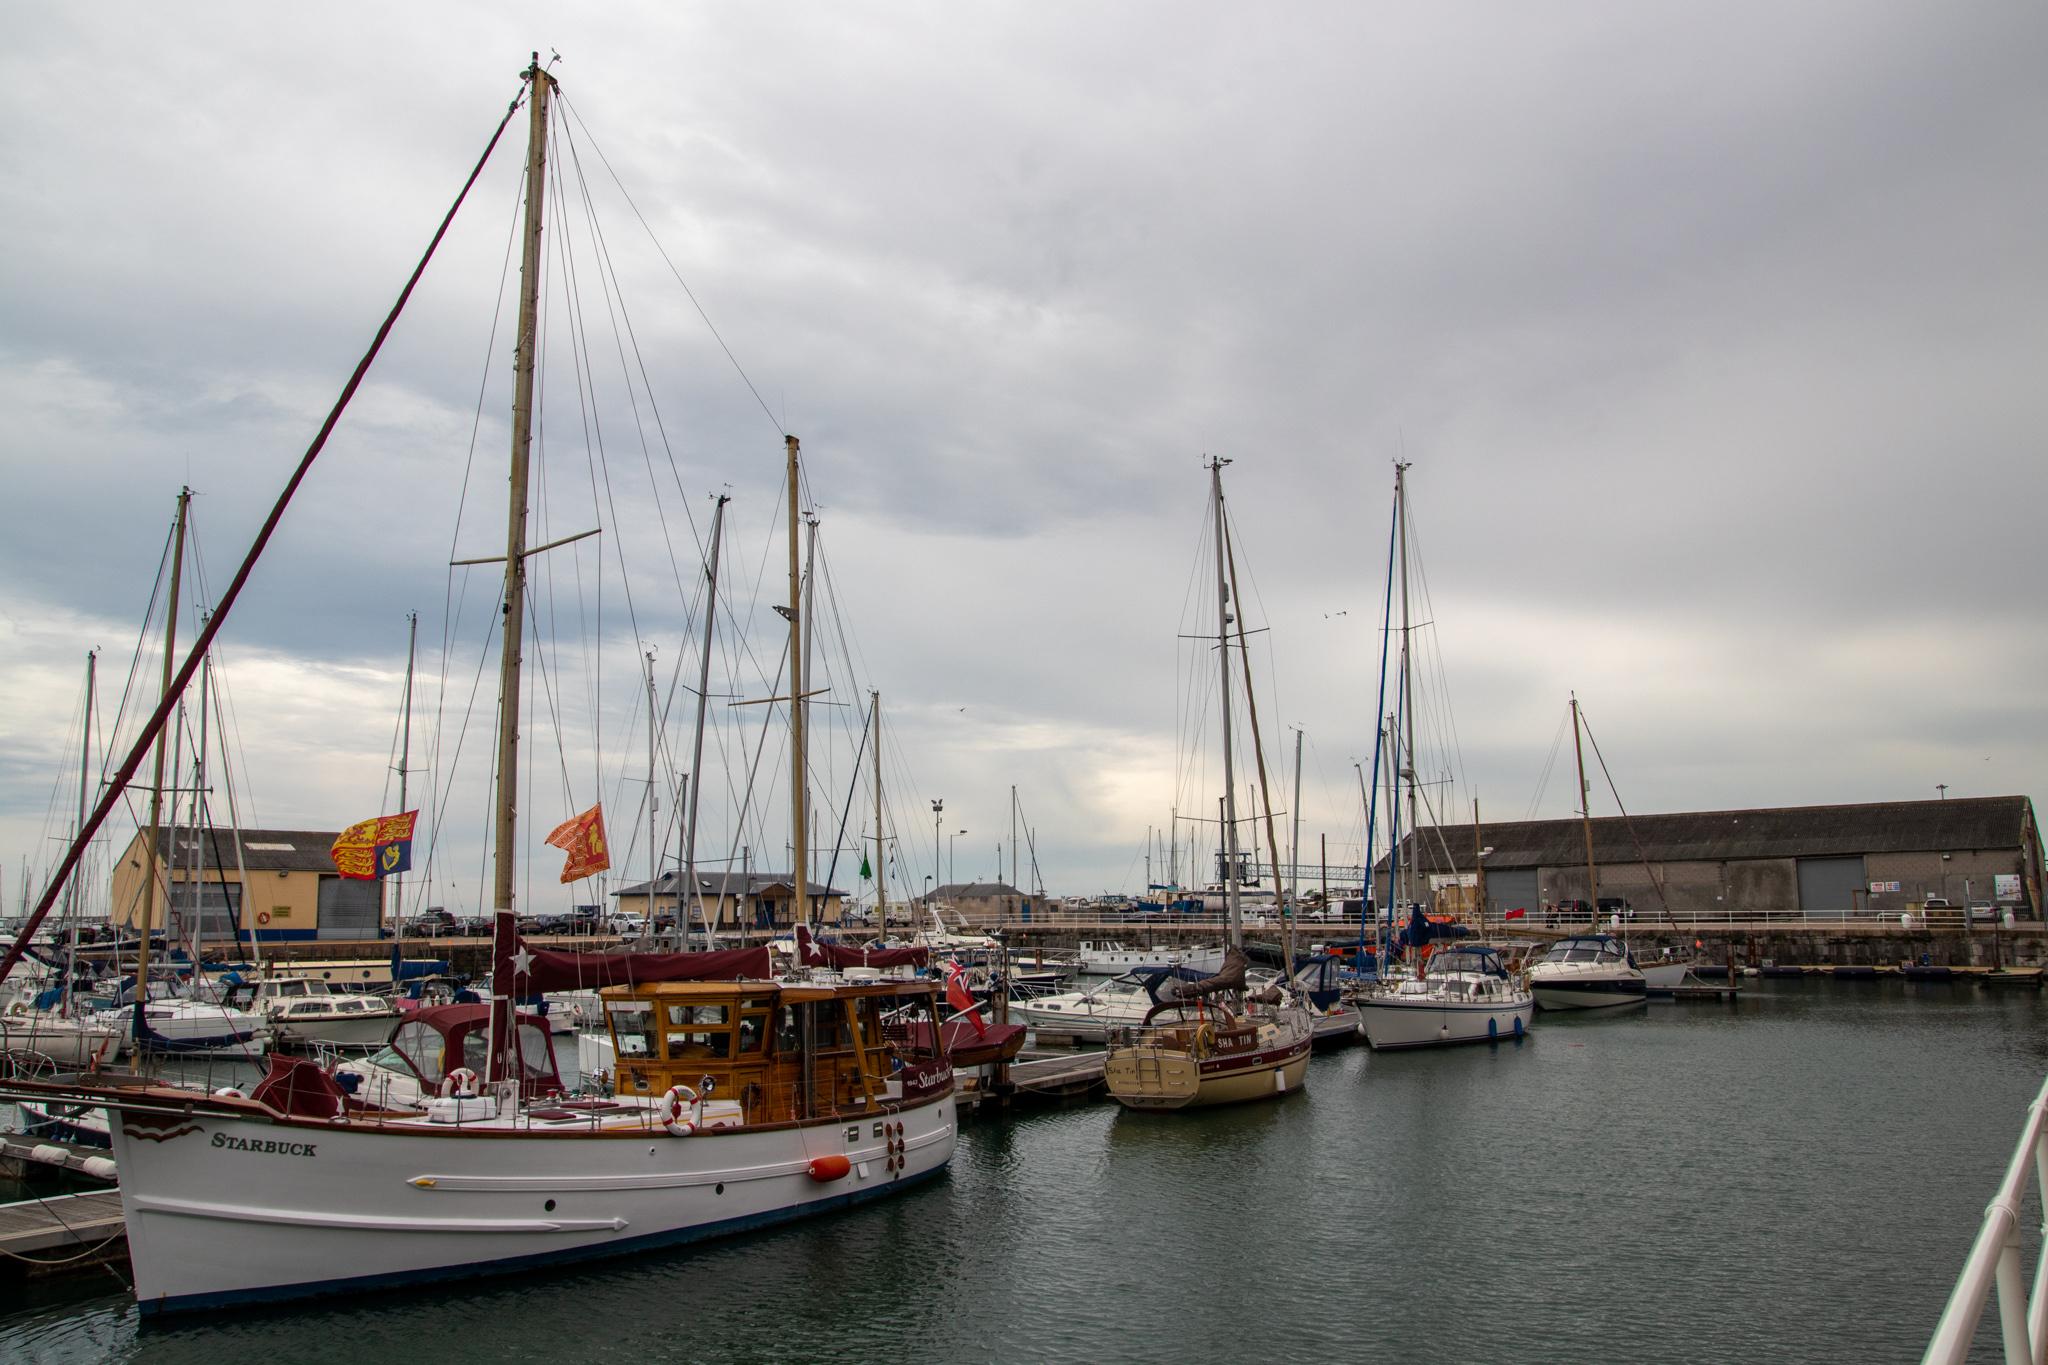 Ramsgate Hafen